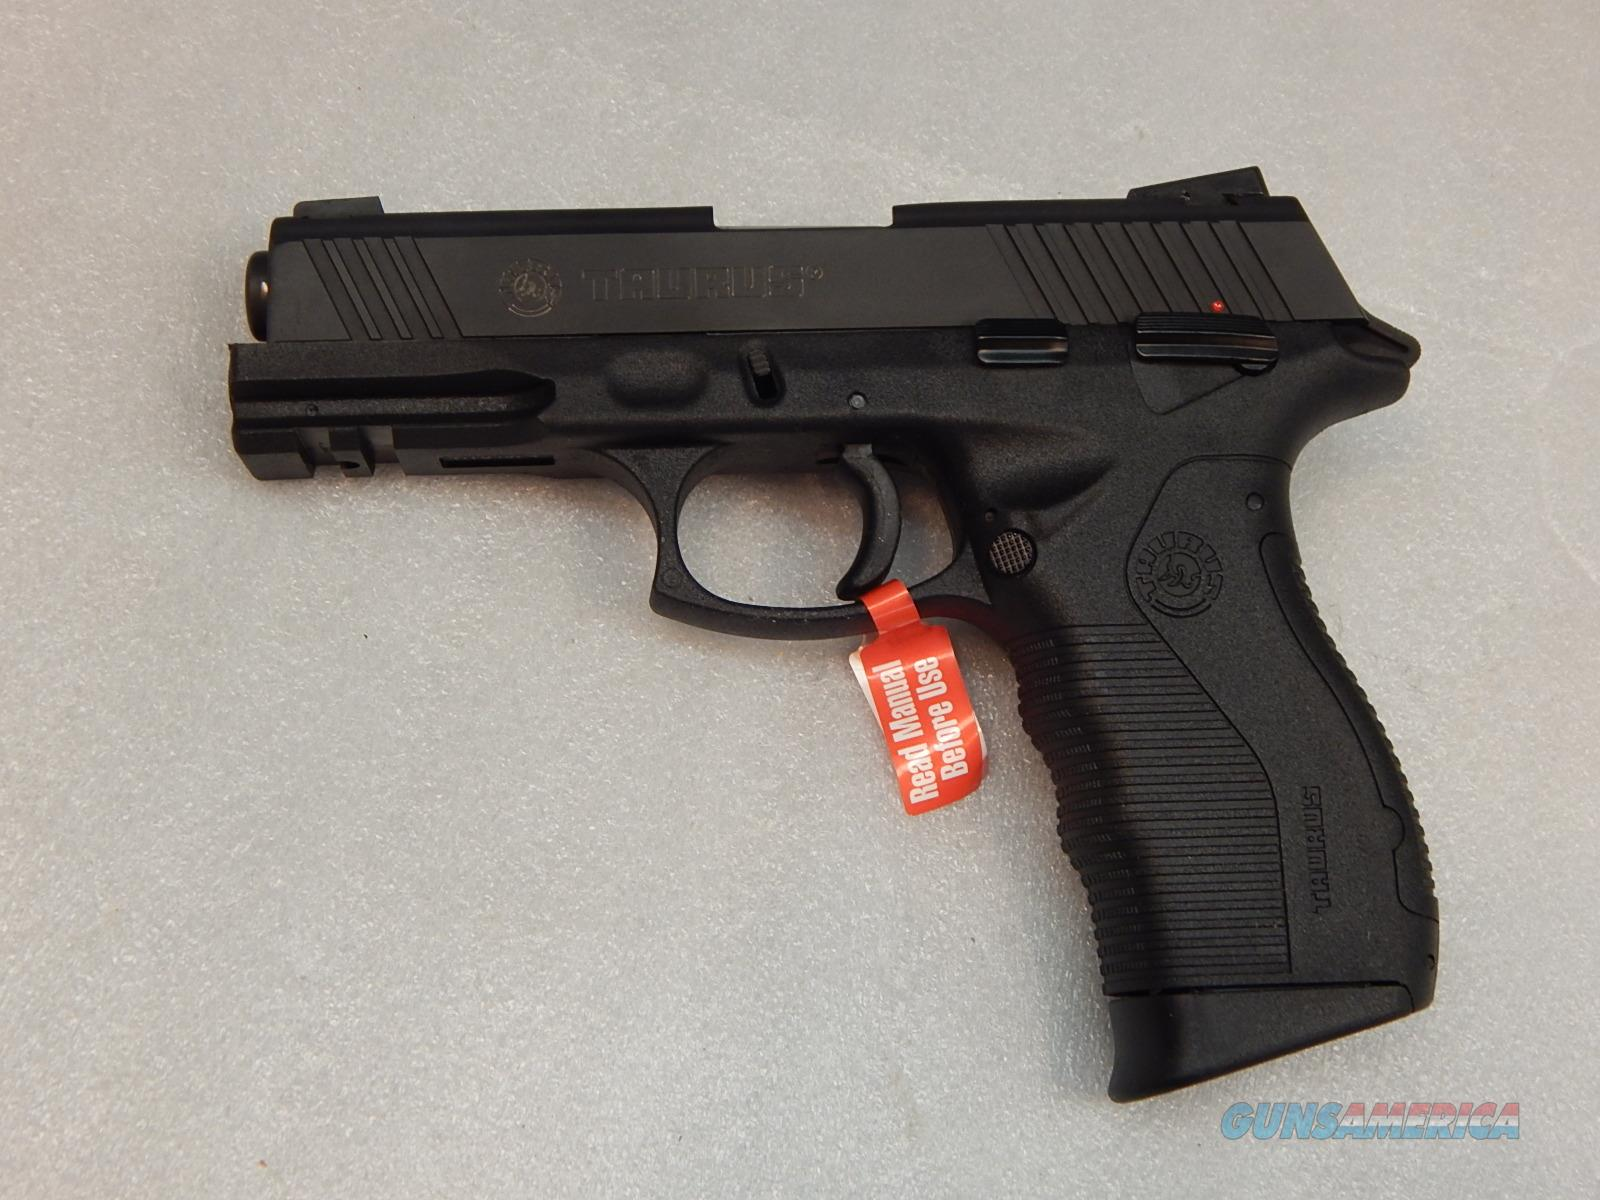 Taurus PT 809 NIB - 2 mags Guns > Pistols > Taurus Pistols > Semi Auto